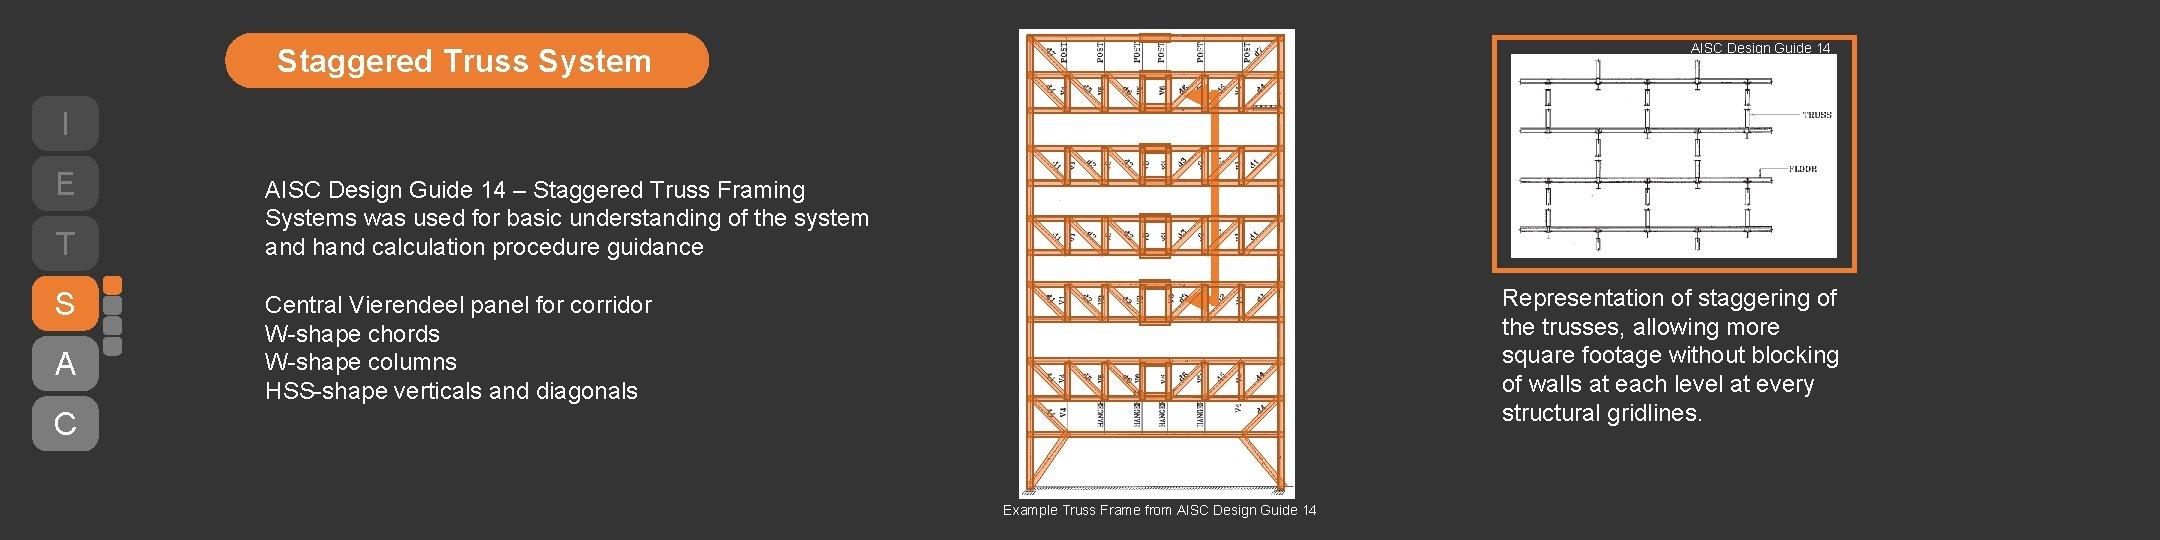 AISC Design Guide 14 Staggered Truss System I E T S A AISC Design